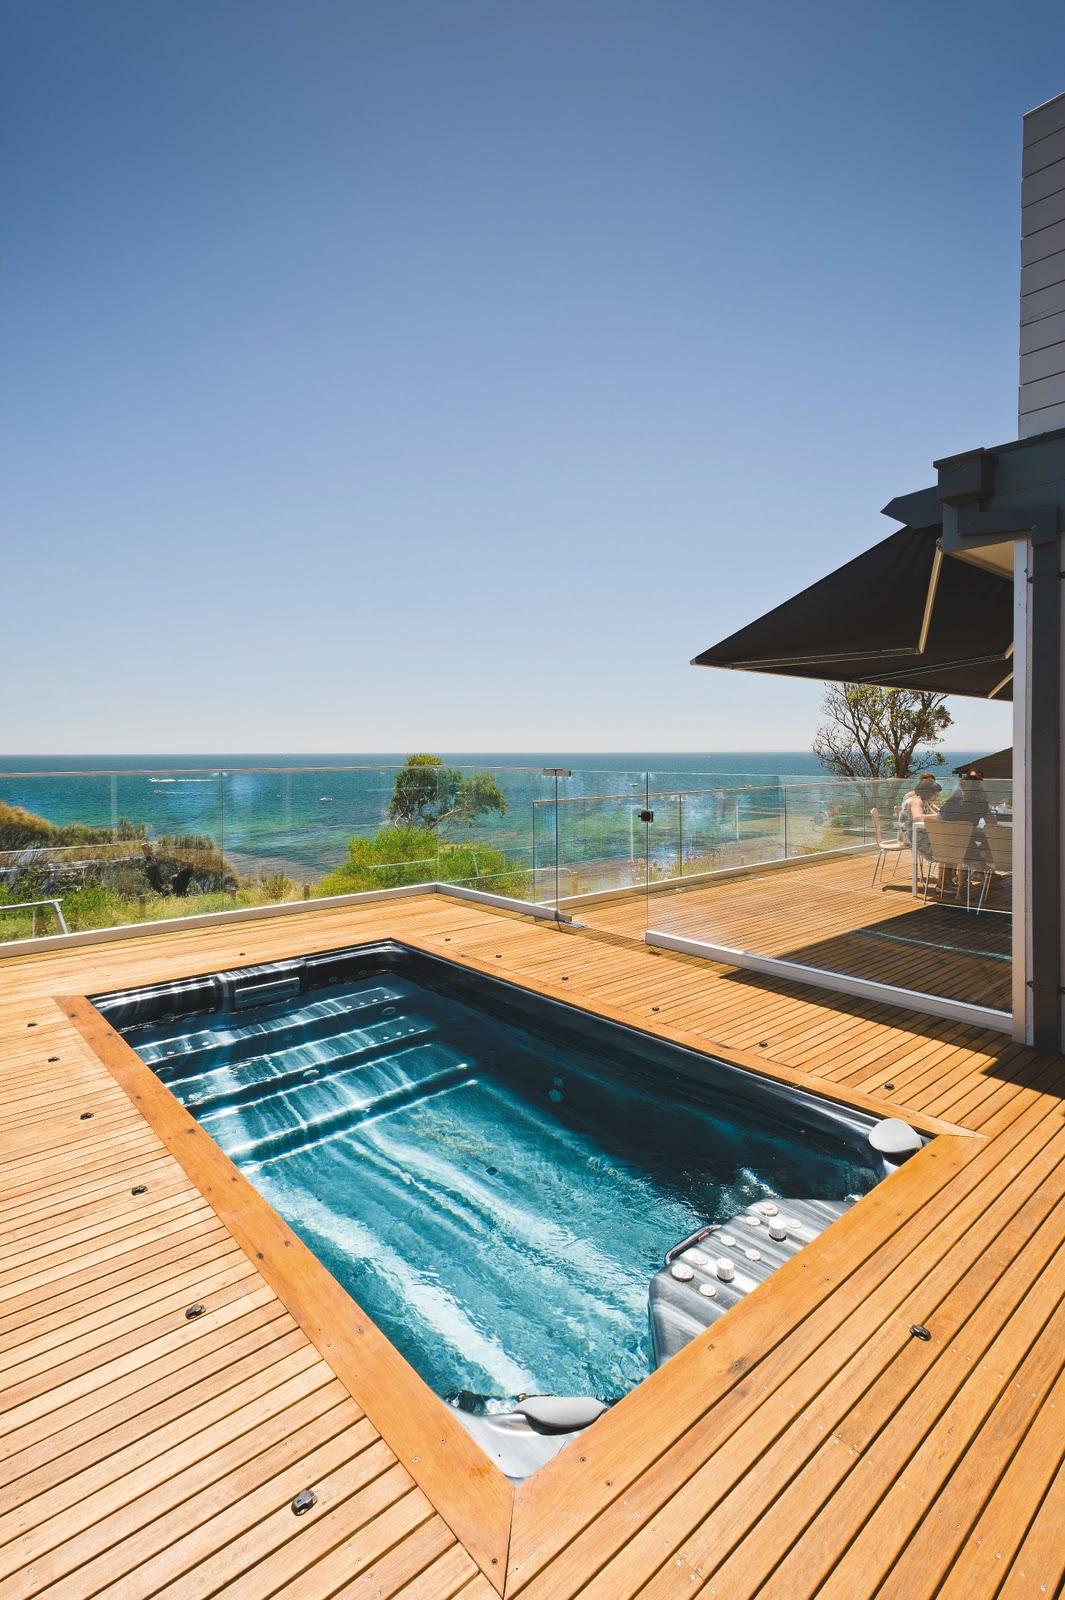 Spas, Spa baths, Swim Spa, Inground Spa, Outdoor Spa, Plunge Pool ...